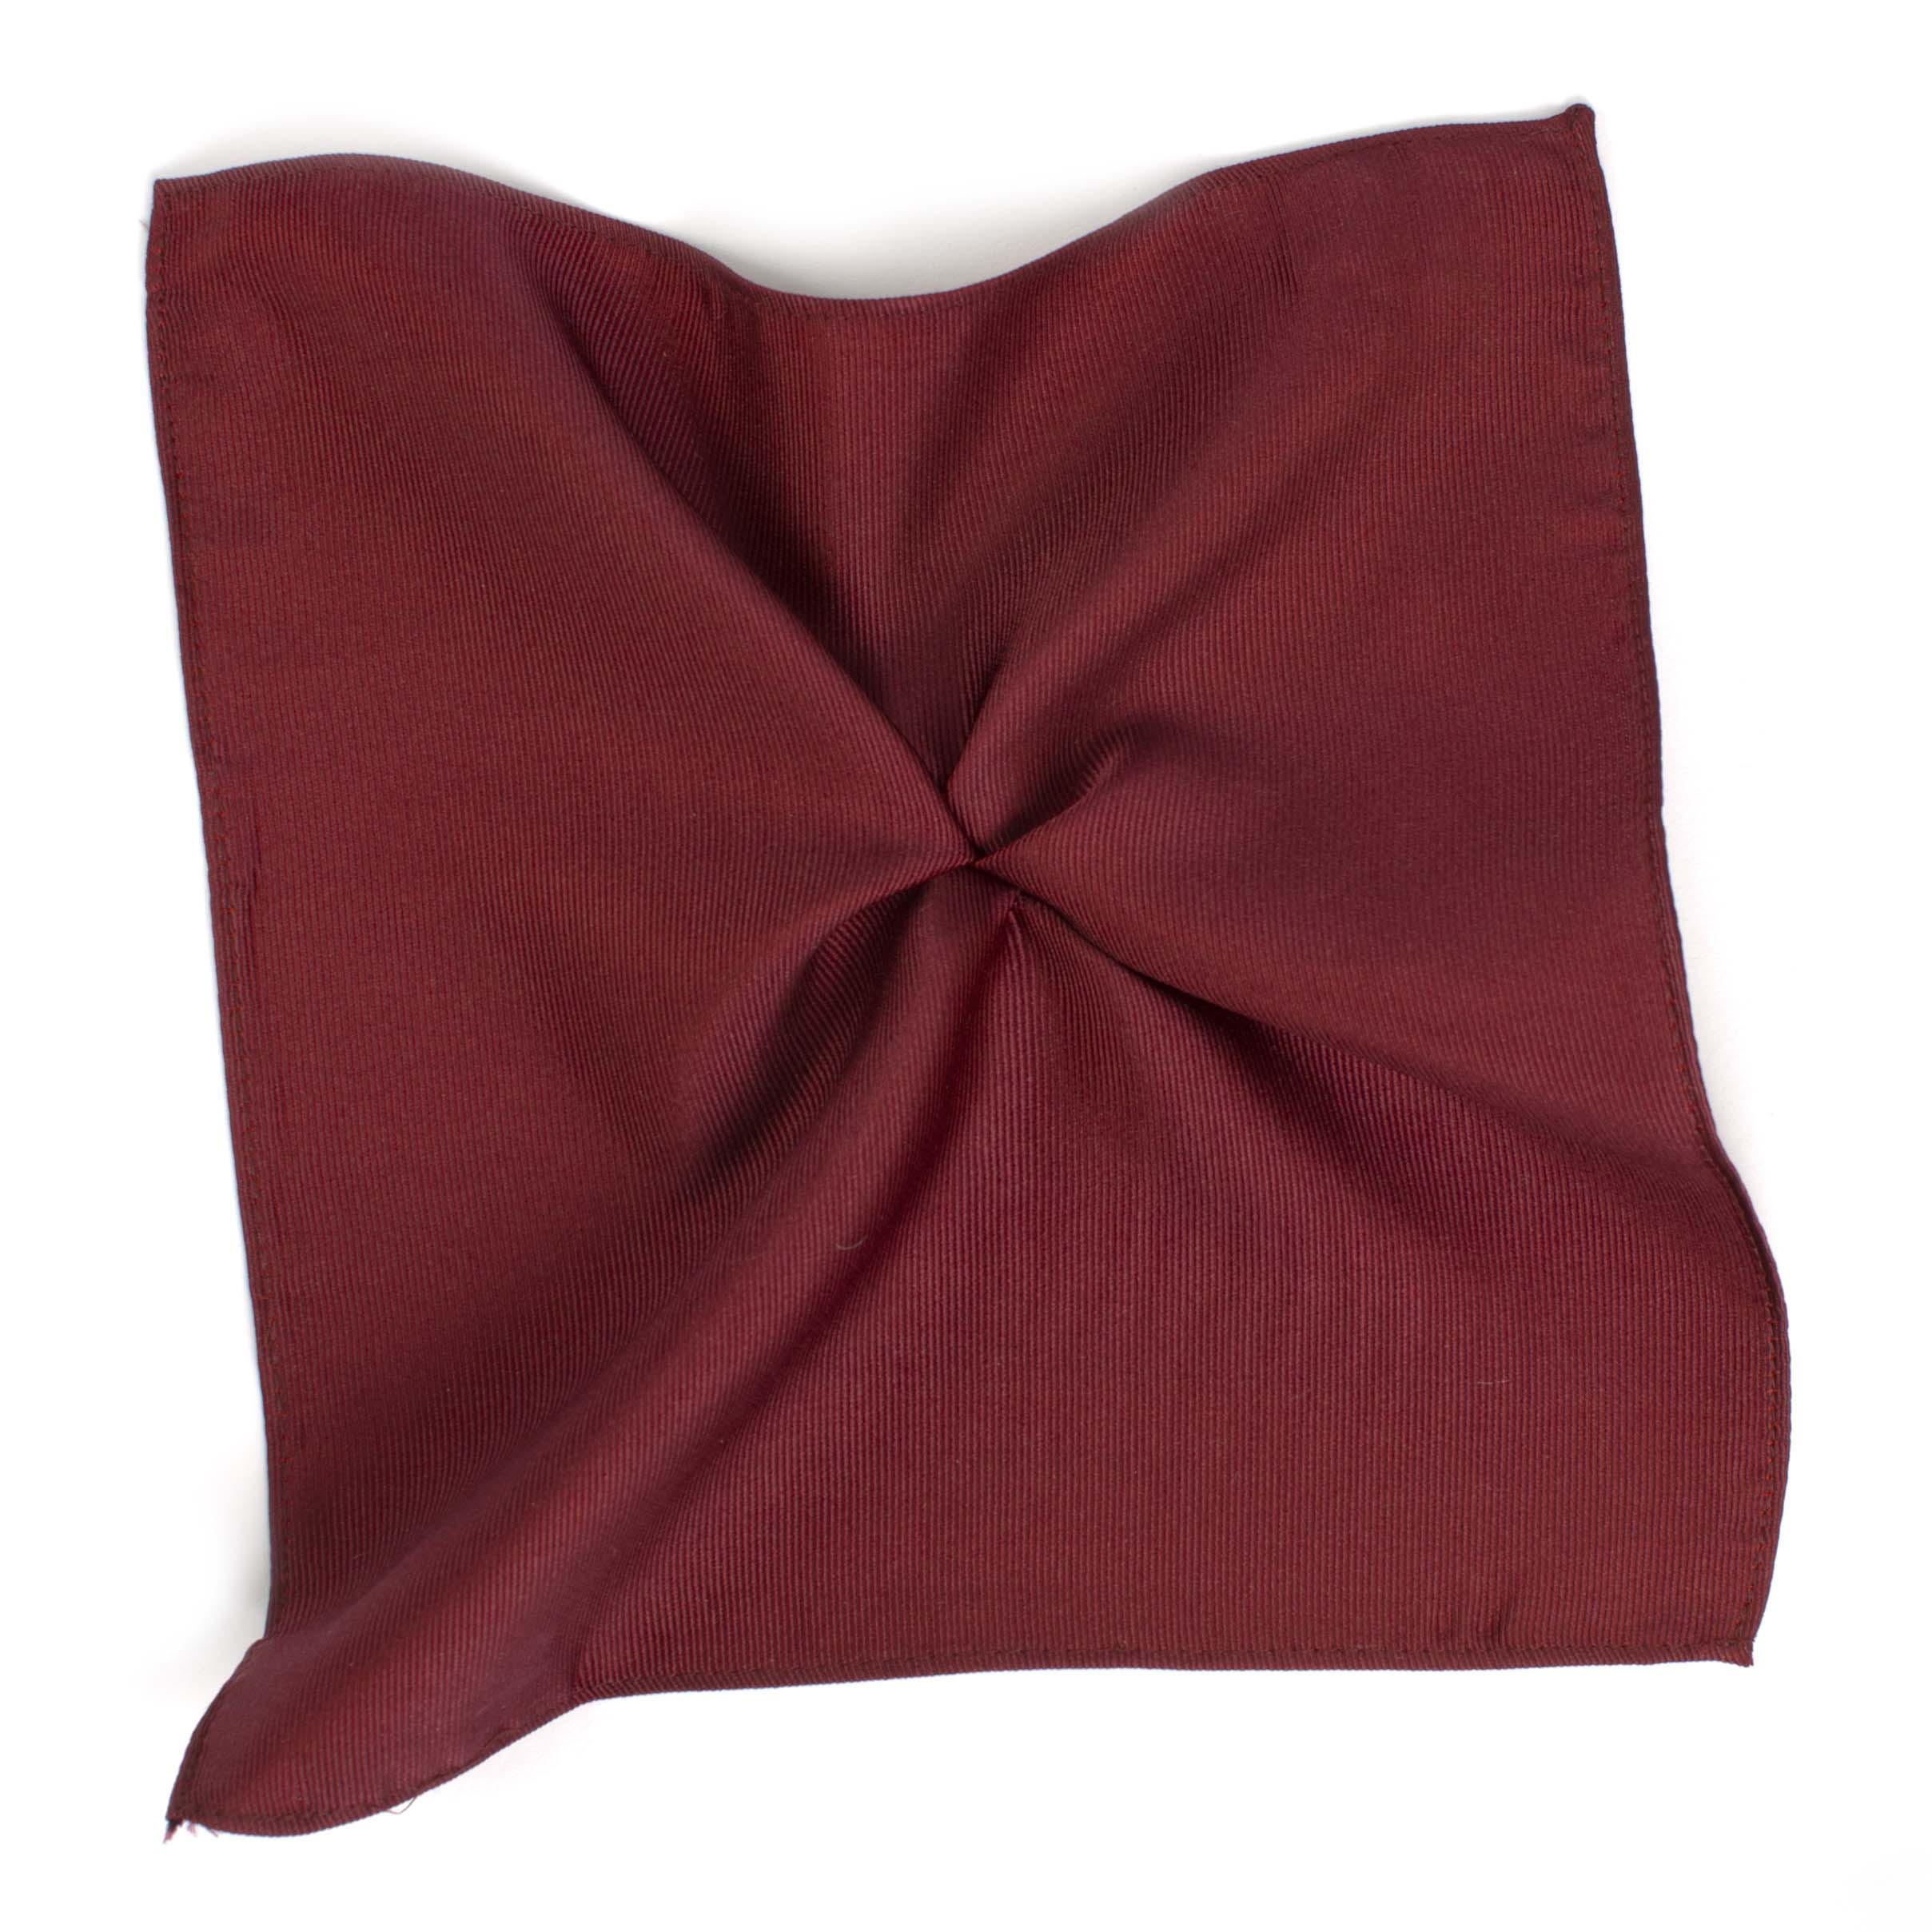 Classic burgundy ribbed pocket square